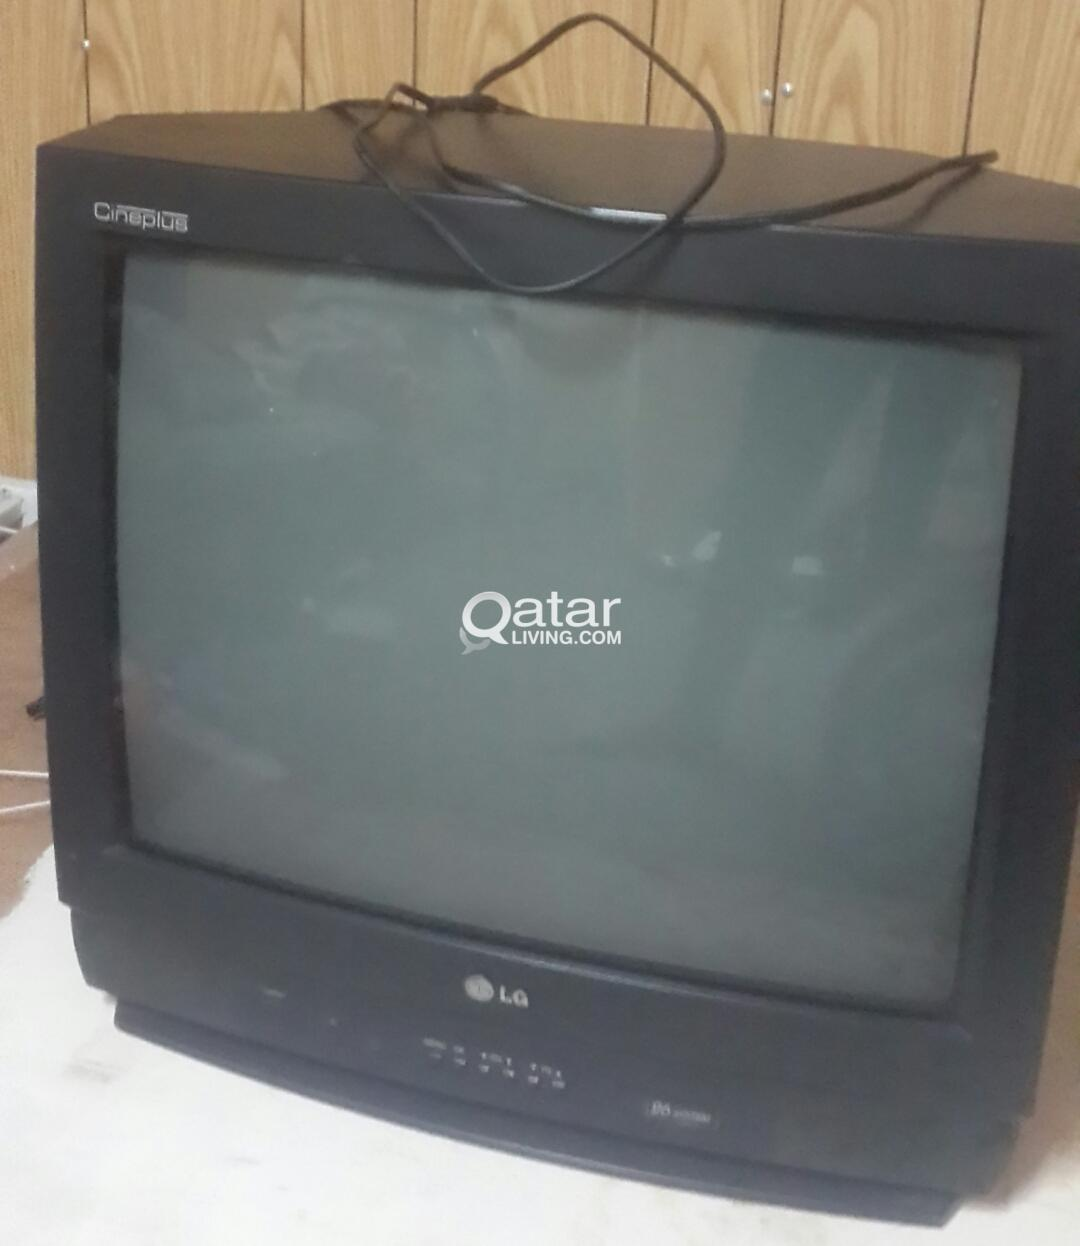 TV LG Cineplus | Qatar Living